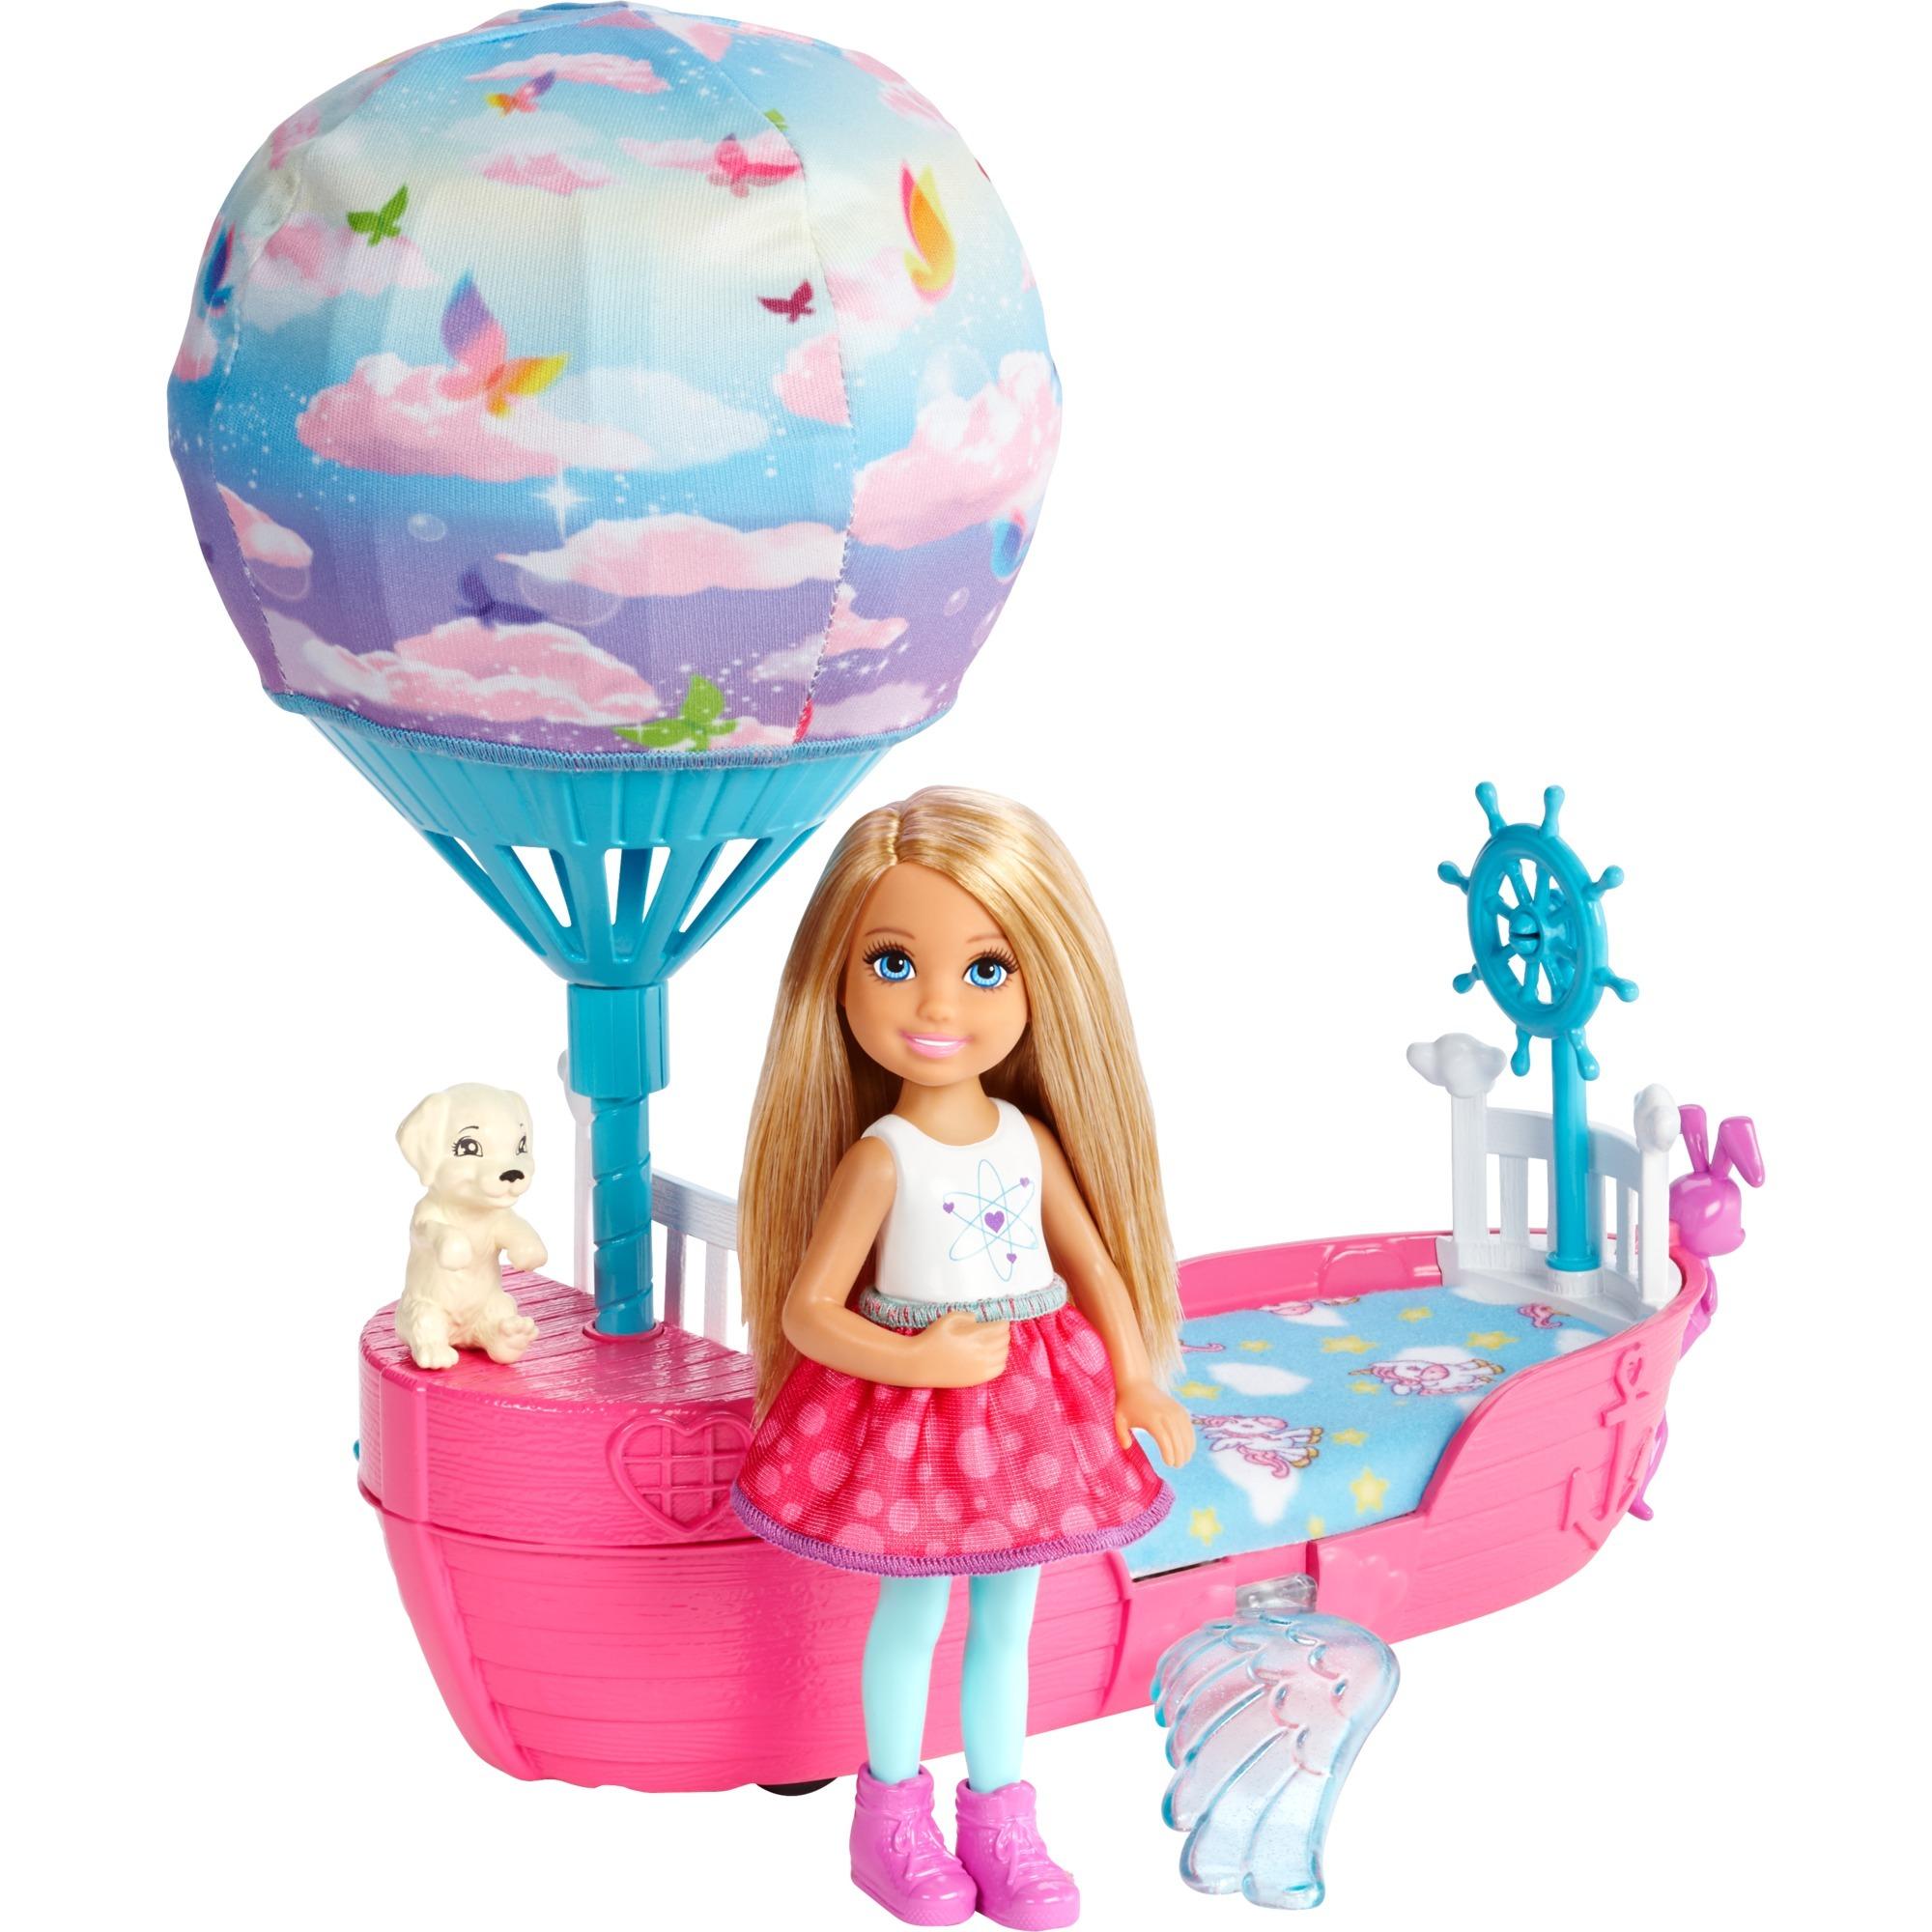 barbie-chelsea-dreamtopia-magisk-drommebaad-dukke